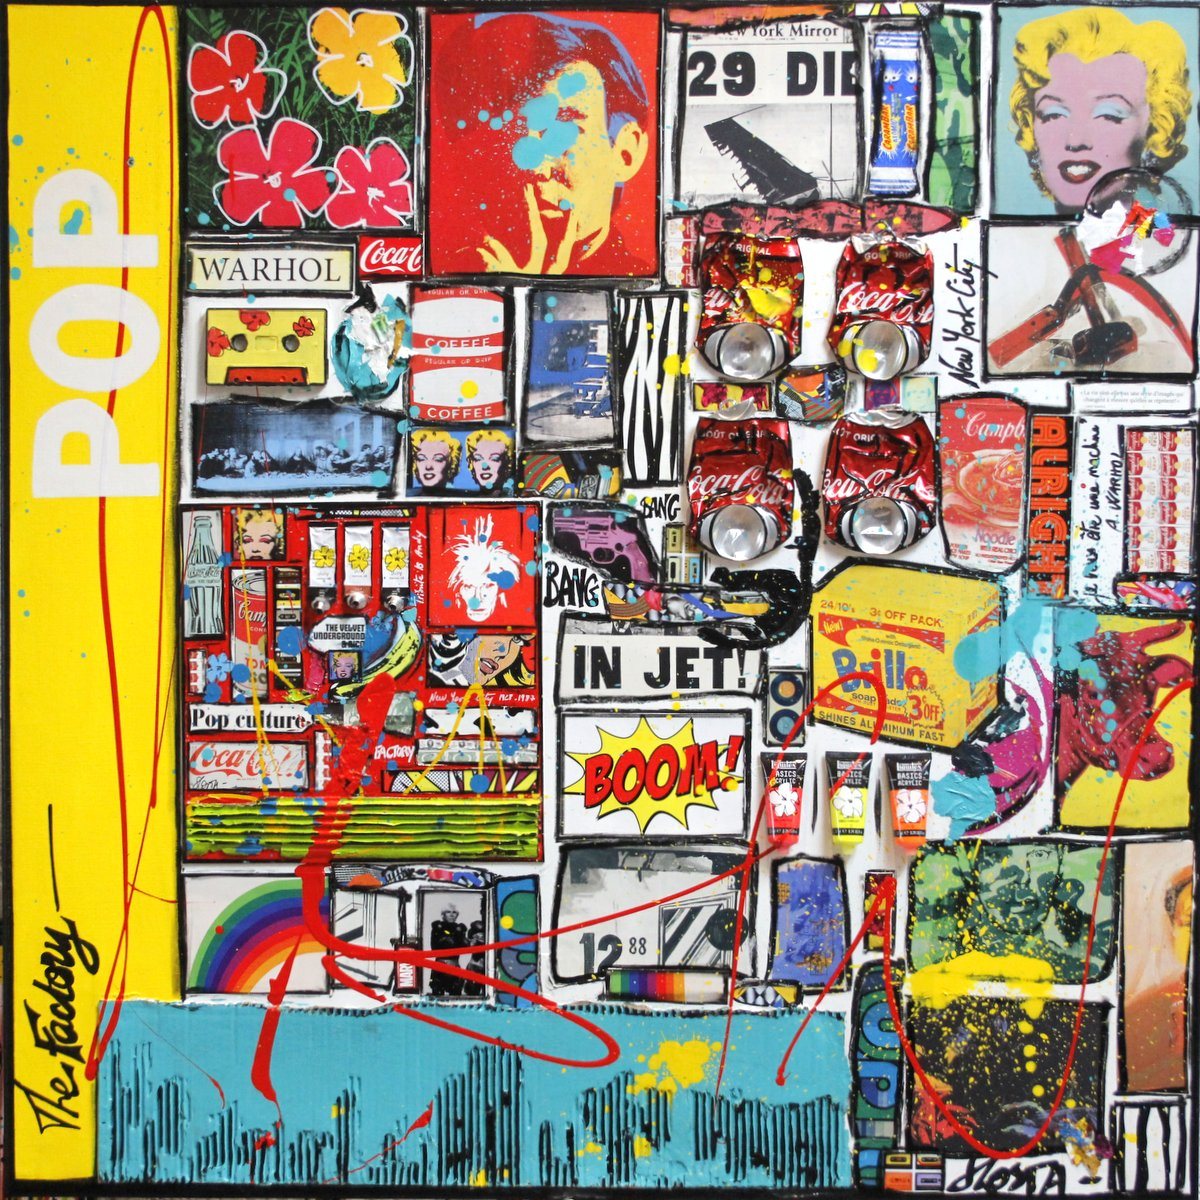 pop art, warhol, collage Tableau Contemporain, POP INCEPTION. Sophie Costa, artiste peintre.